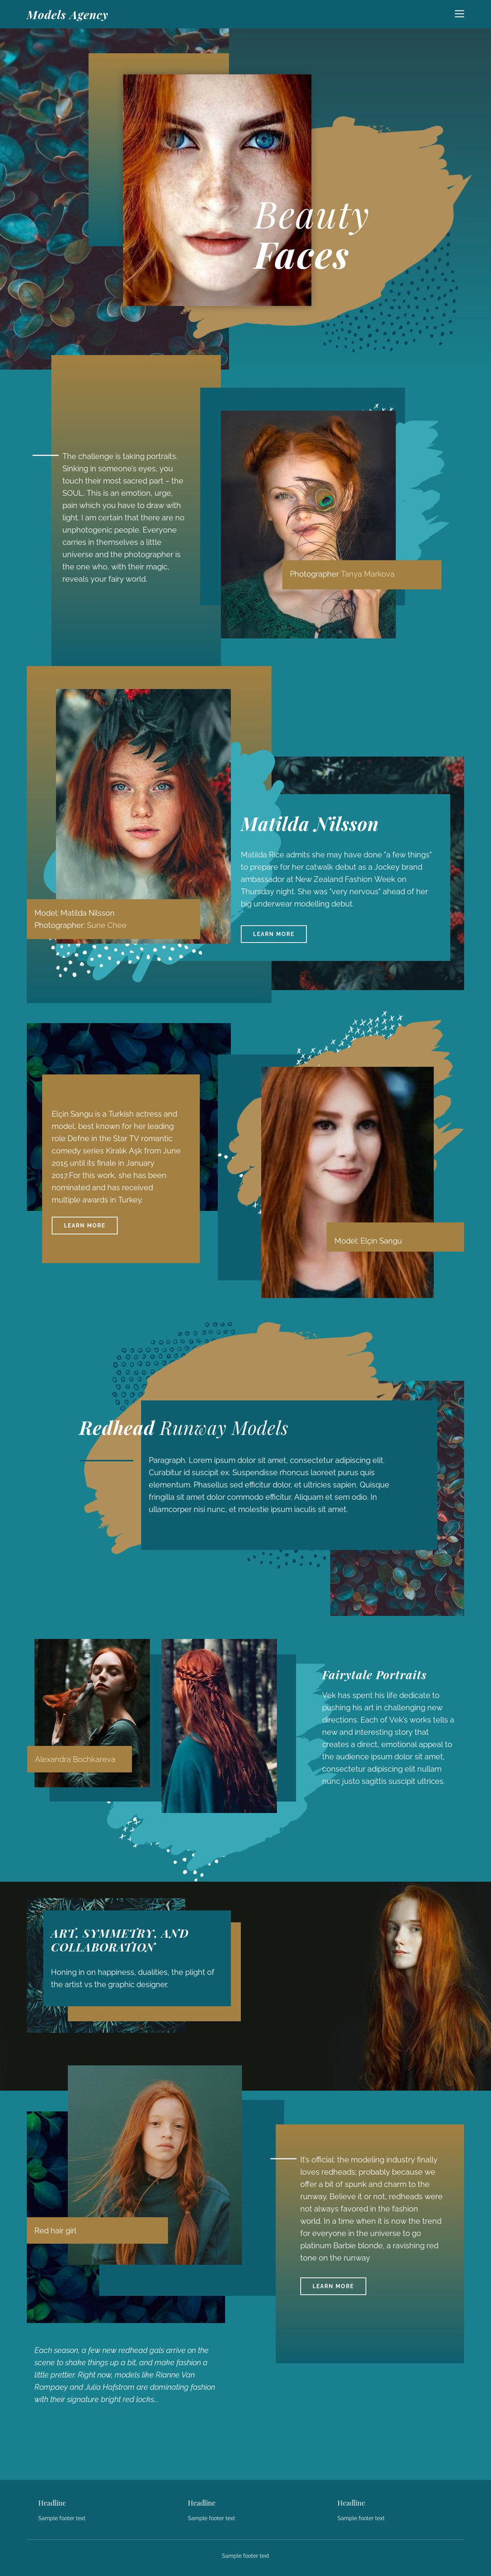 Faces of modern fashion Website Design